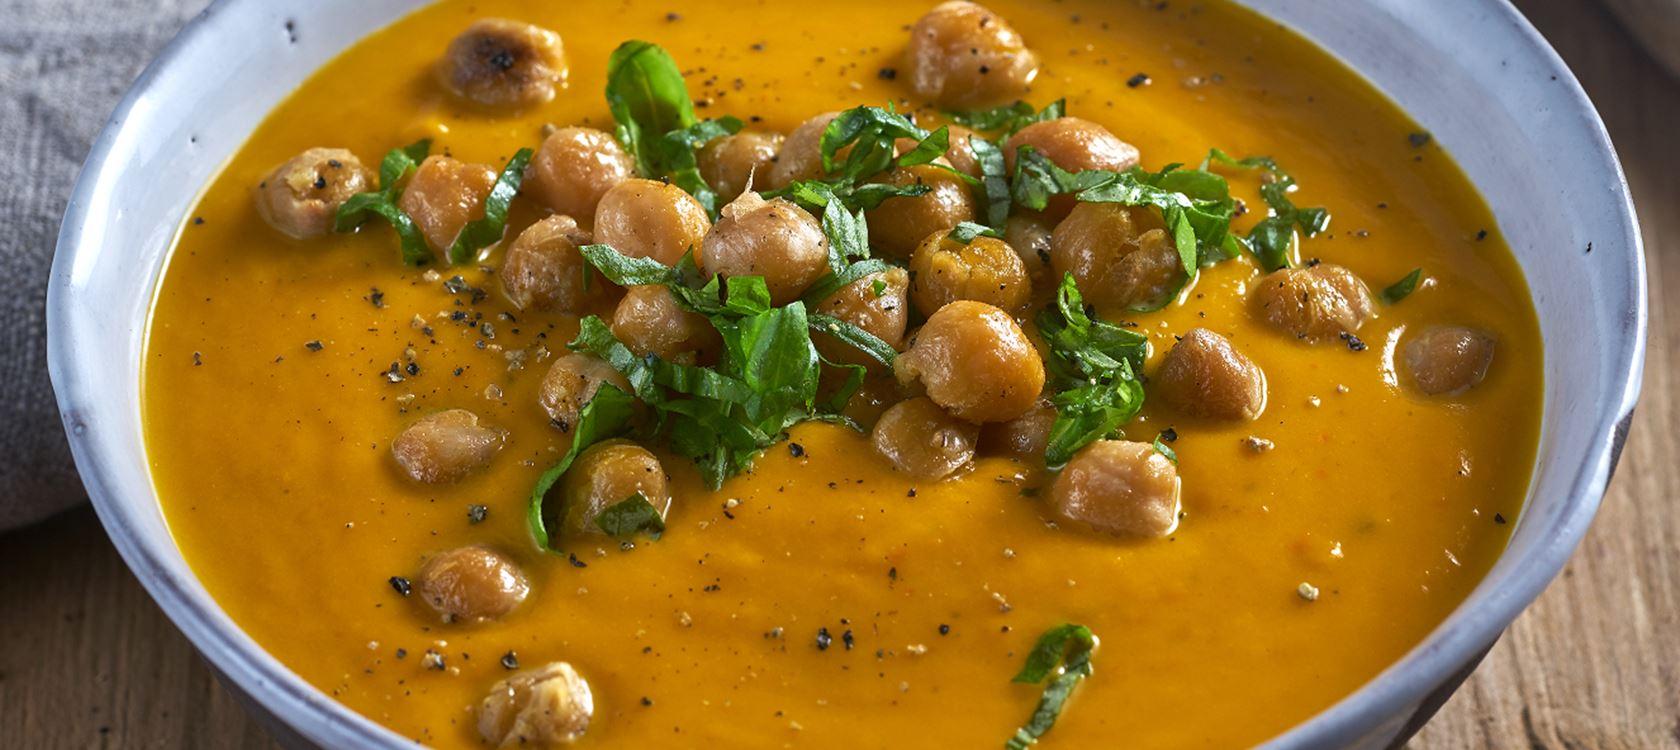 Kürbissuppe mit Arla Buko® Toskana